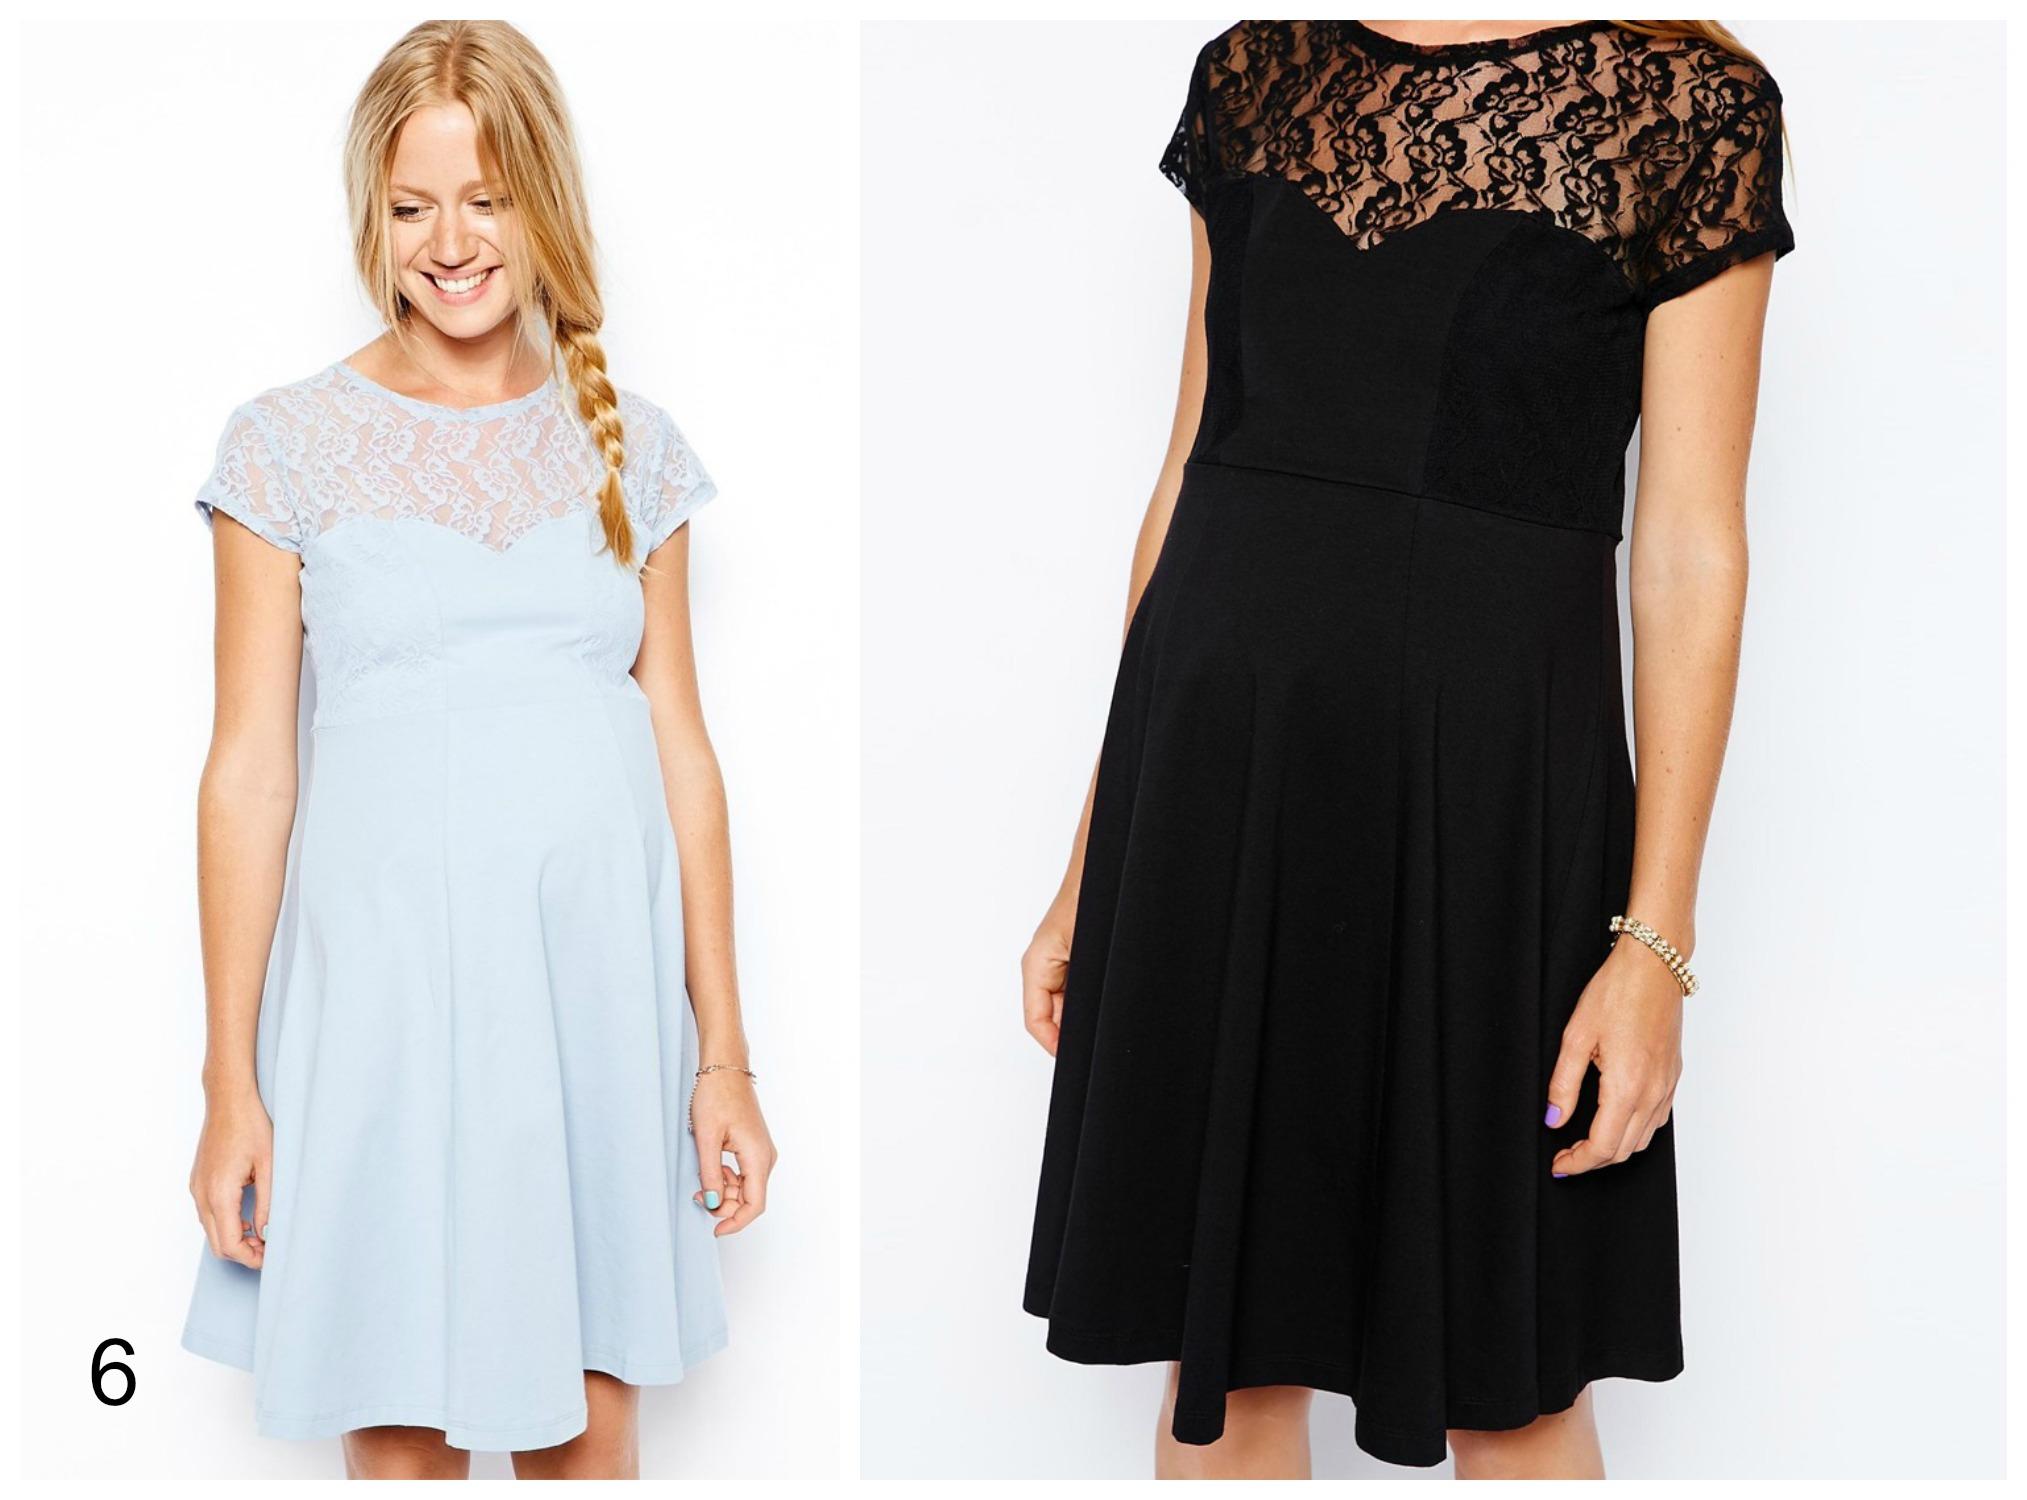 Top 10 maternity summer dresses so sue me maternity 3 ombrellifo Choice Image